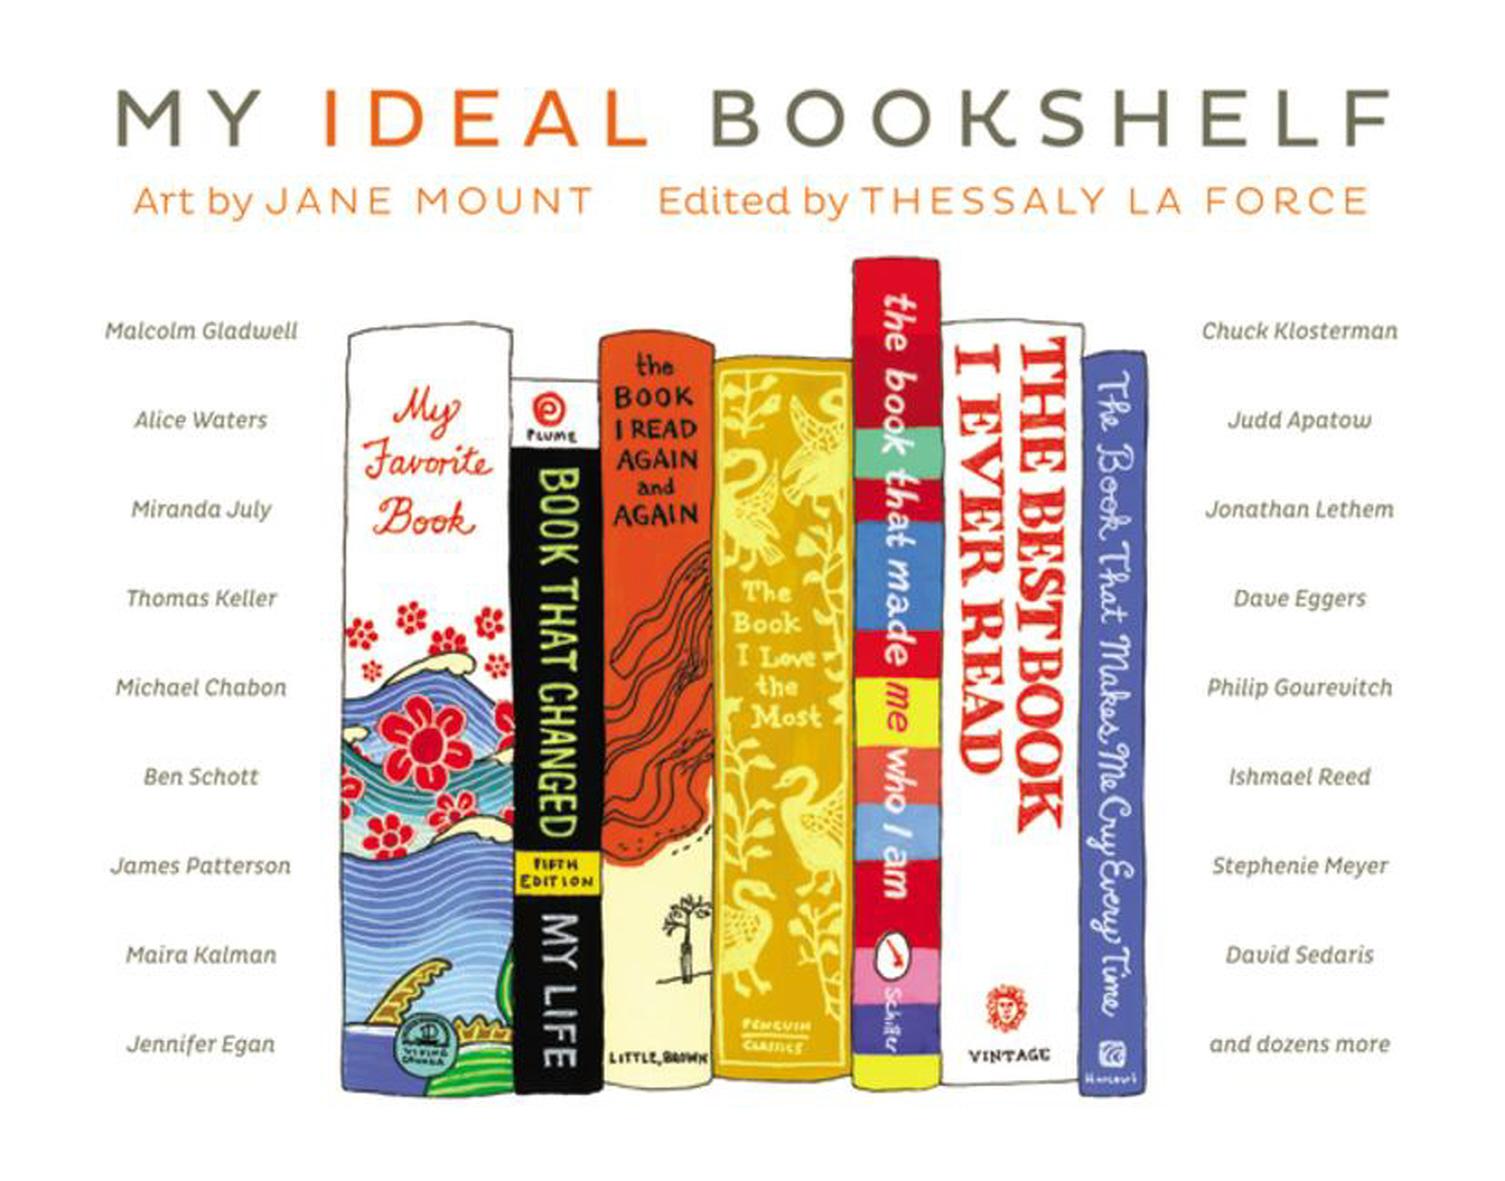 book haunt of decisive writers